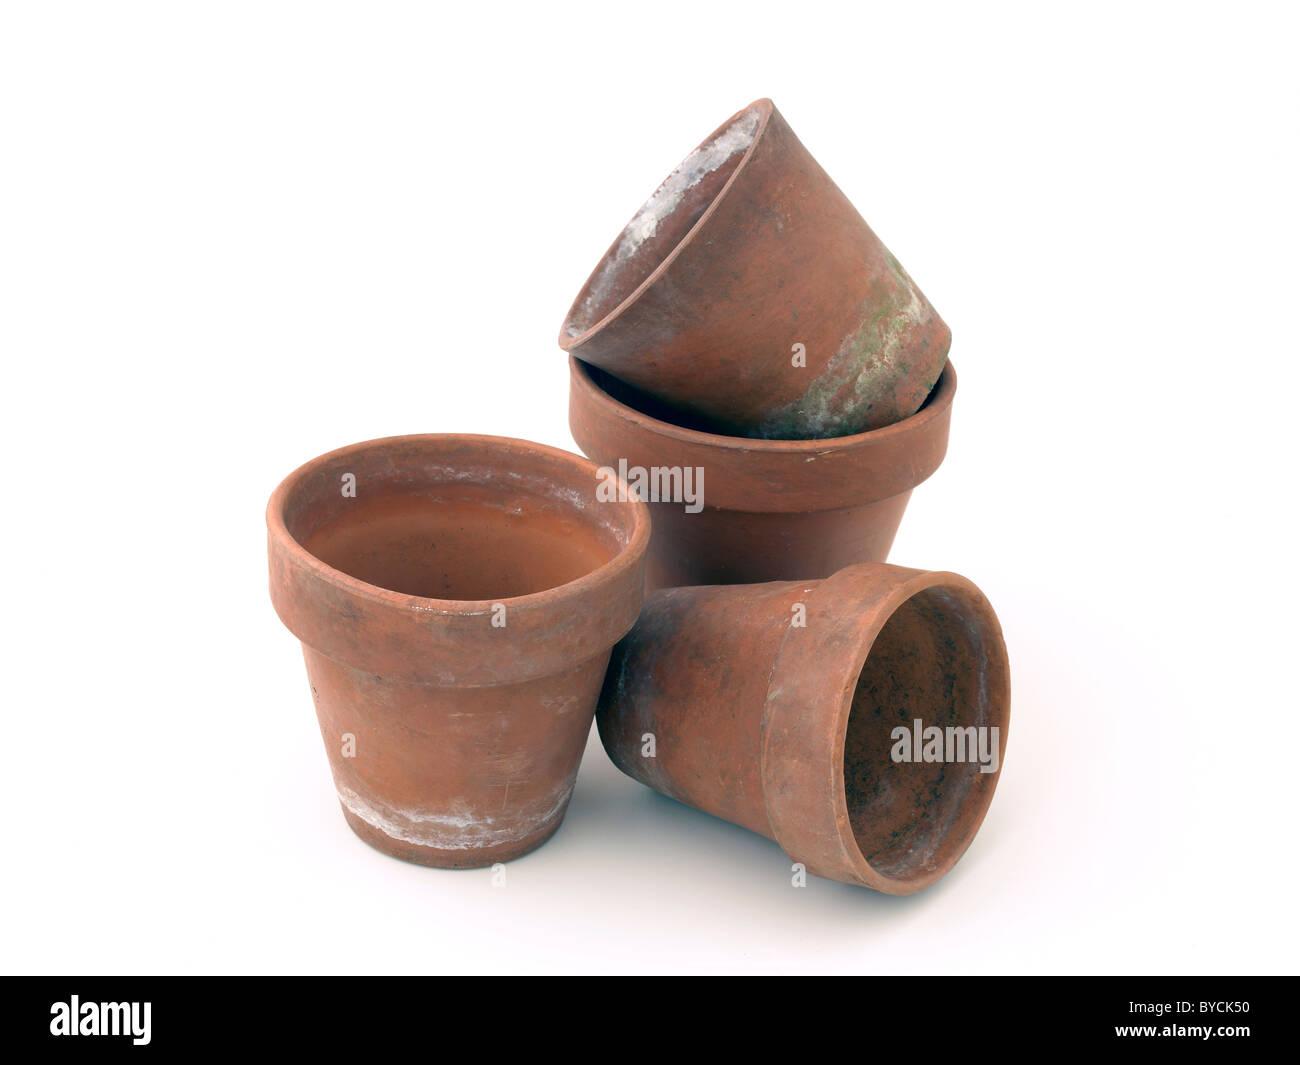 flower pots - Stock Image